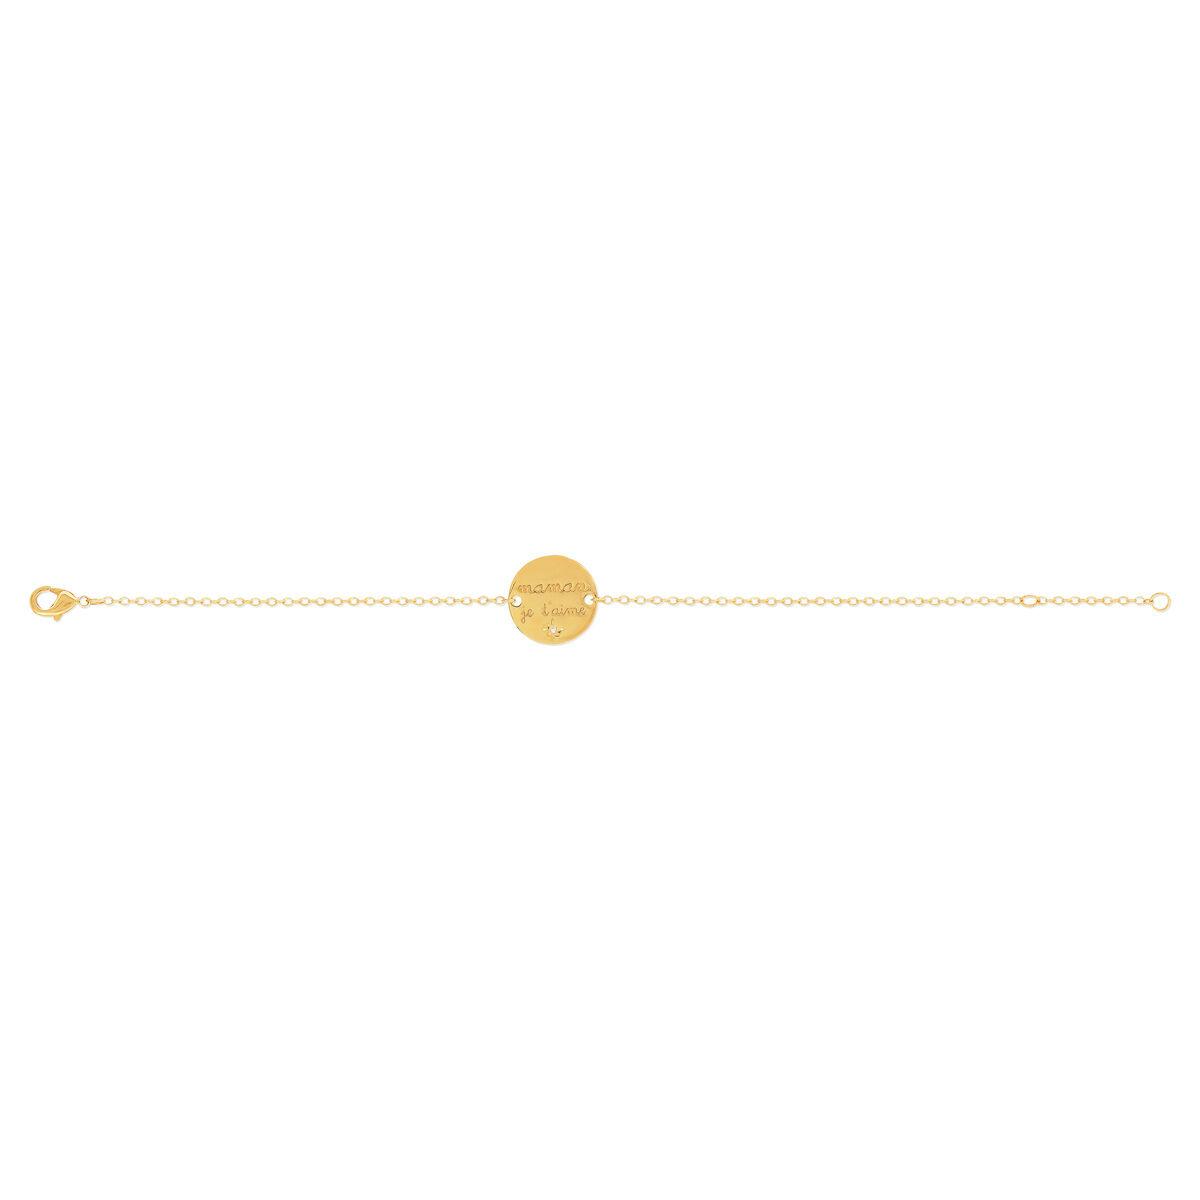 MATY Bracelet plaqué or médaille maman je t'aime zirconia 18 cm- MATY